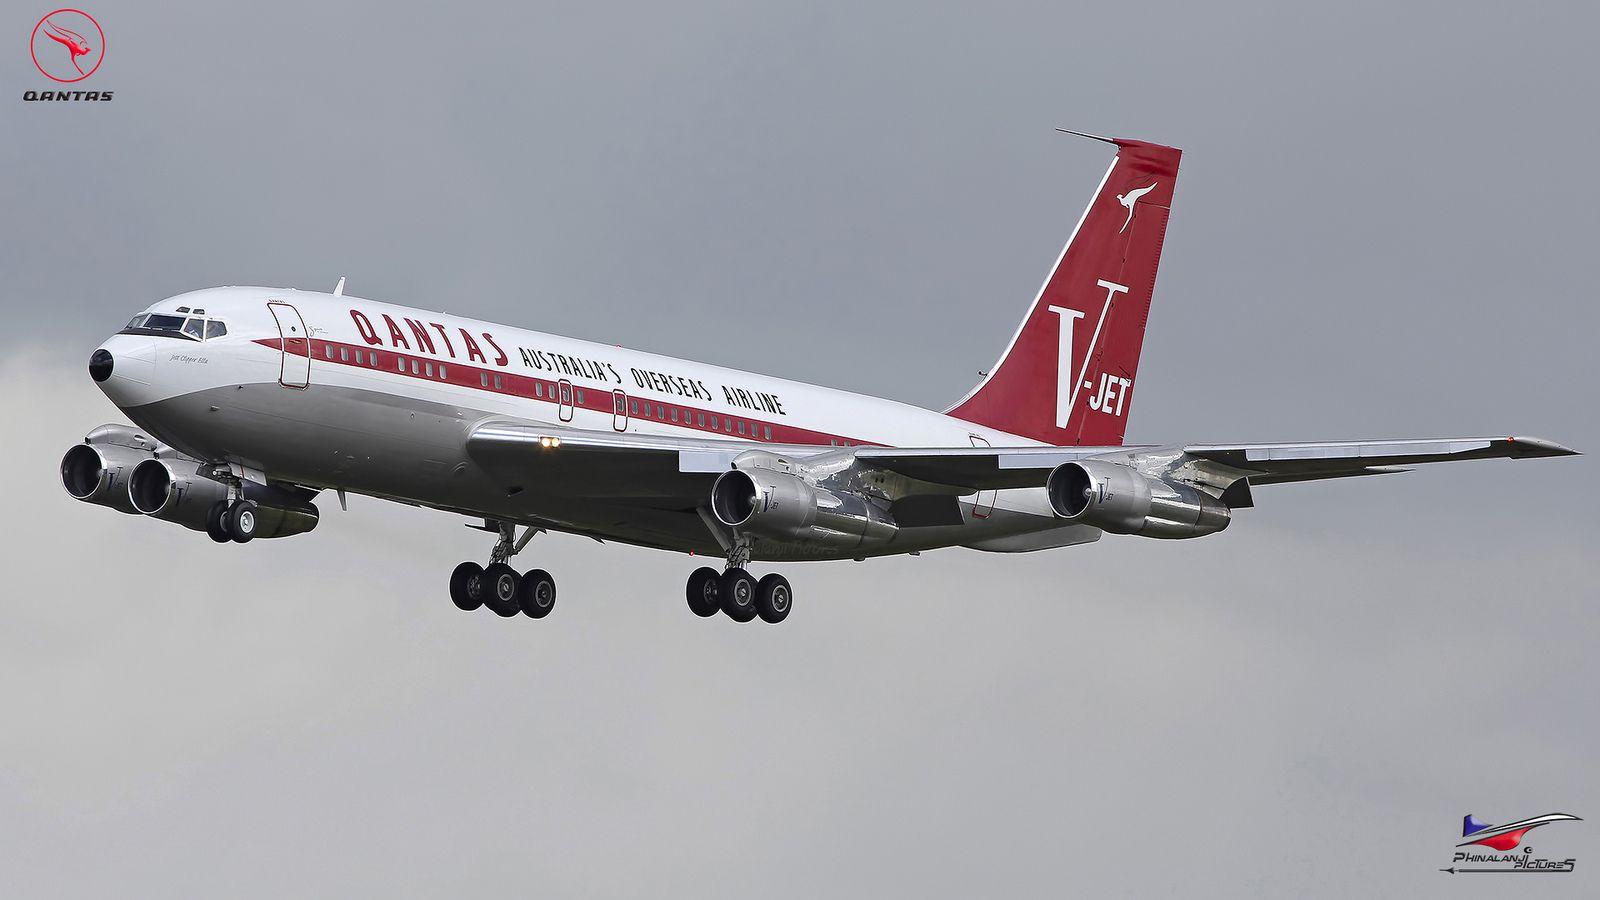 Qantas Boeing 707 138b N707jt John Travolta S Boeing 707 Boeing 707 Aircraft Boeing